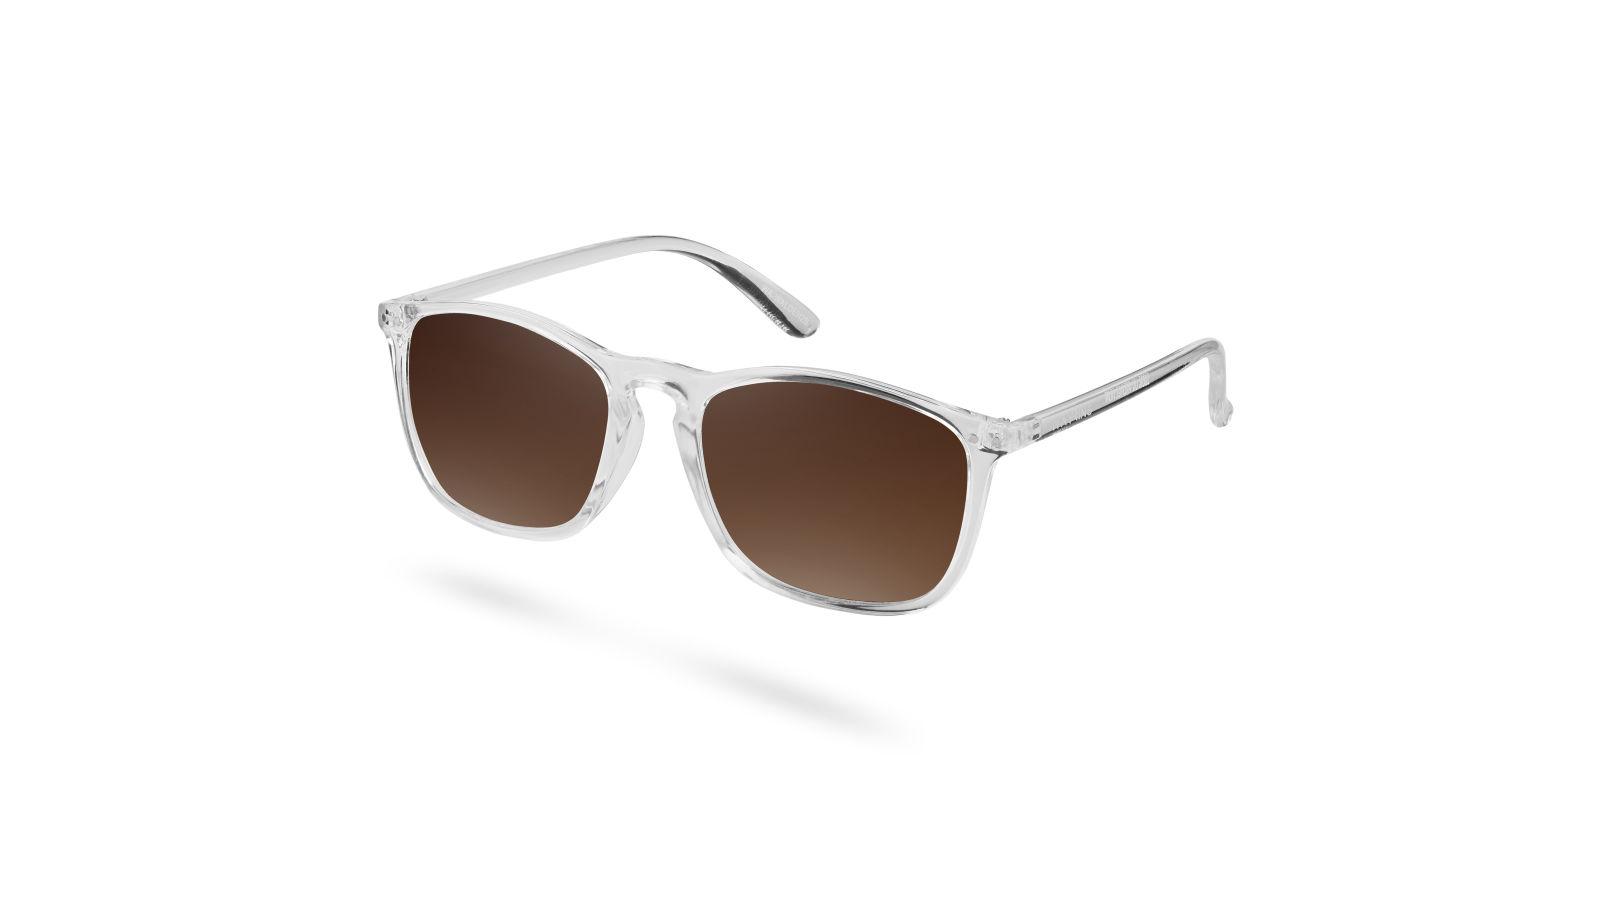 265ff15452 Γυαλιά Ηλίου Walden Clear   Brown